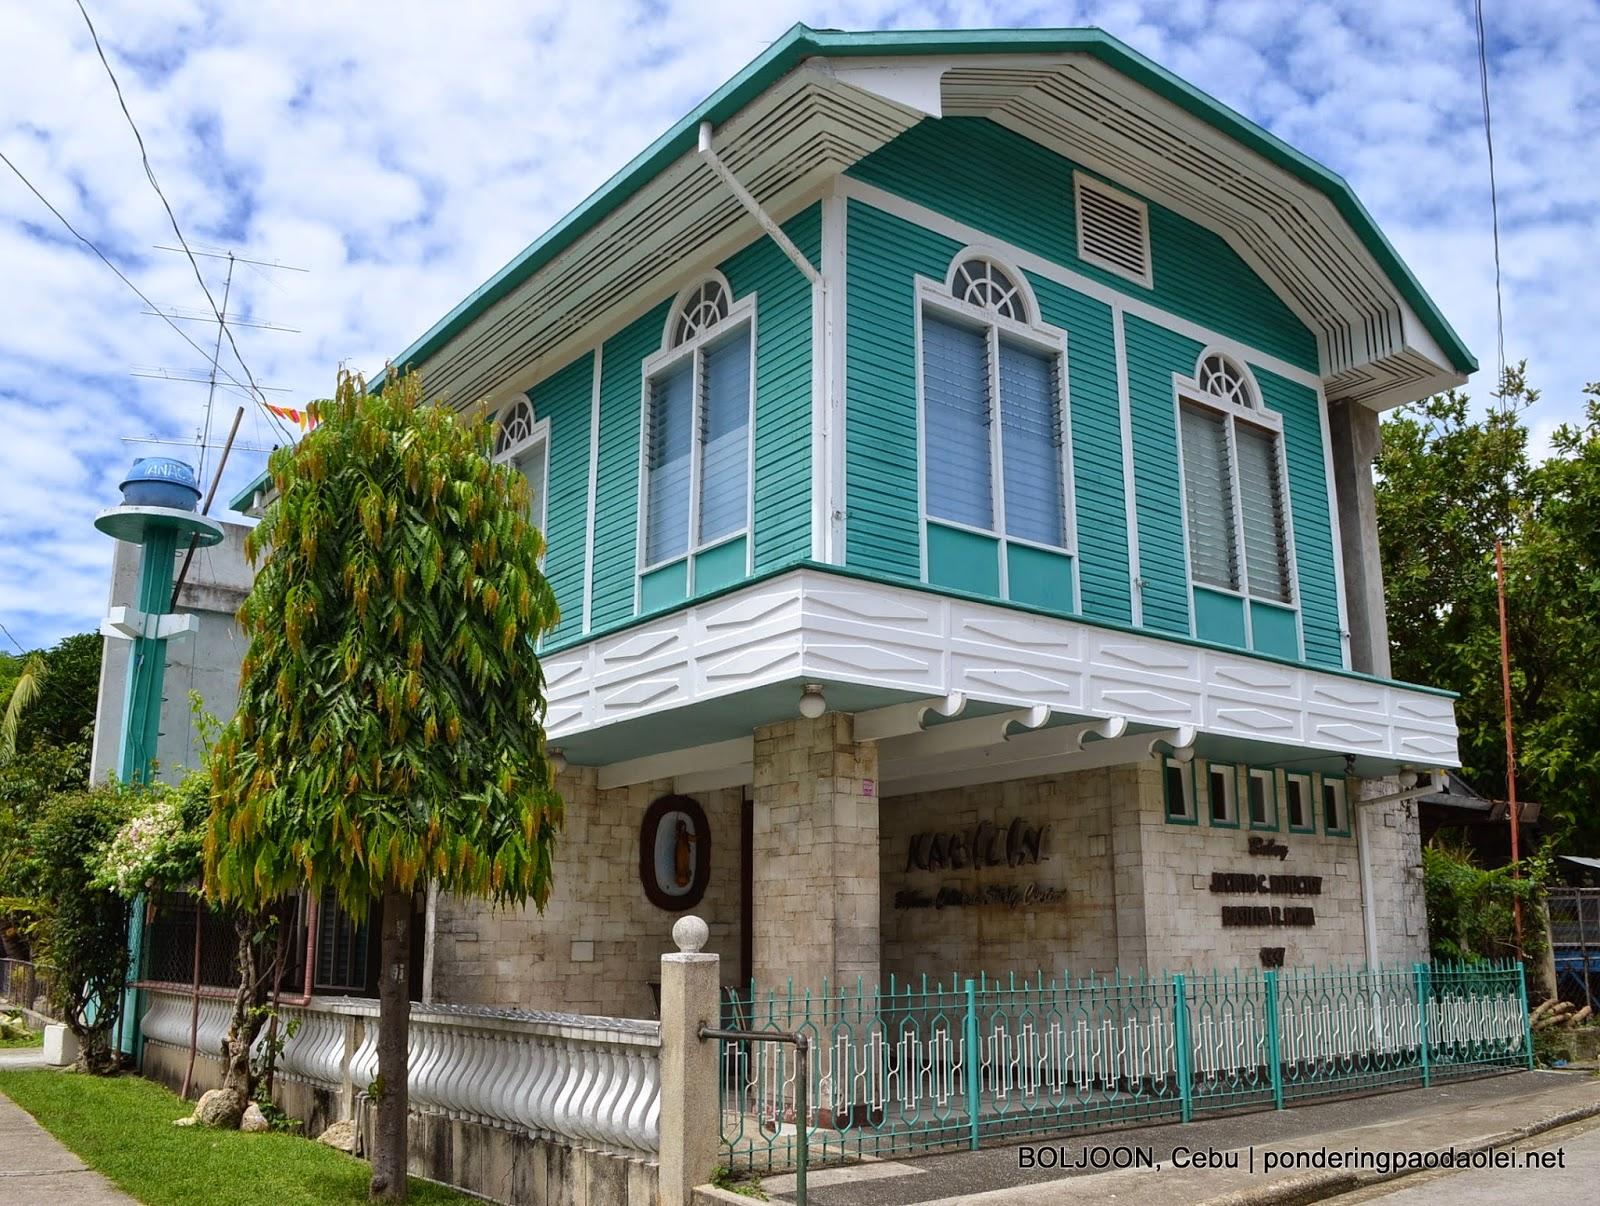 The Varied Old Homes of Boljoon